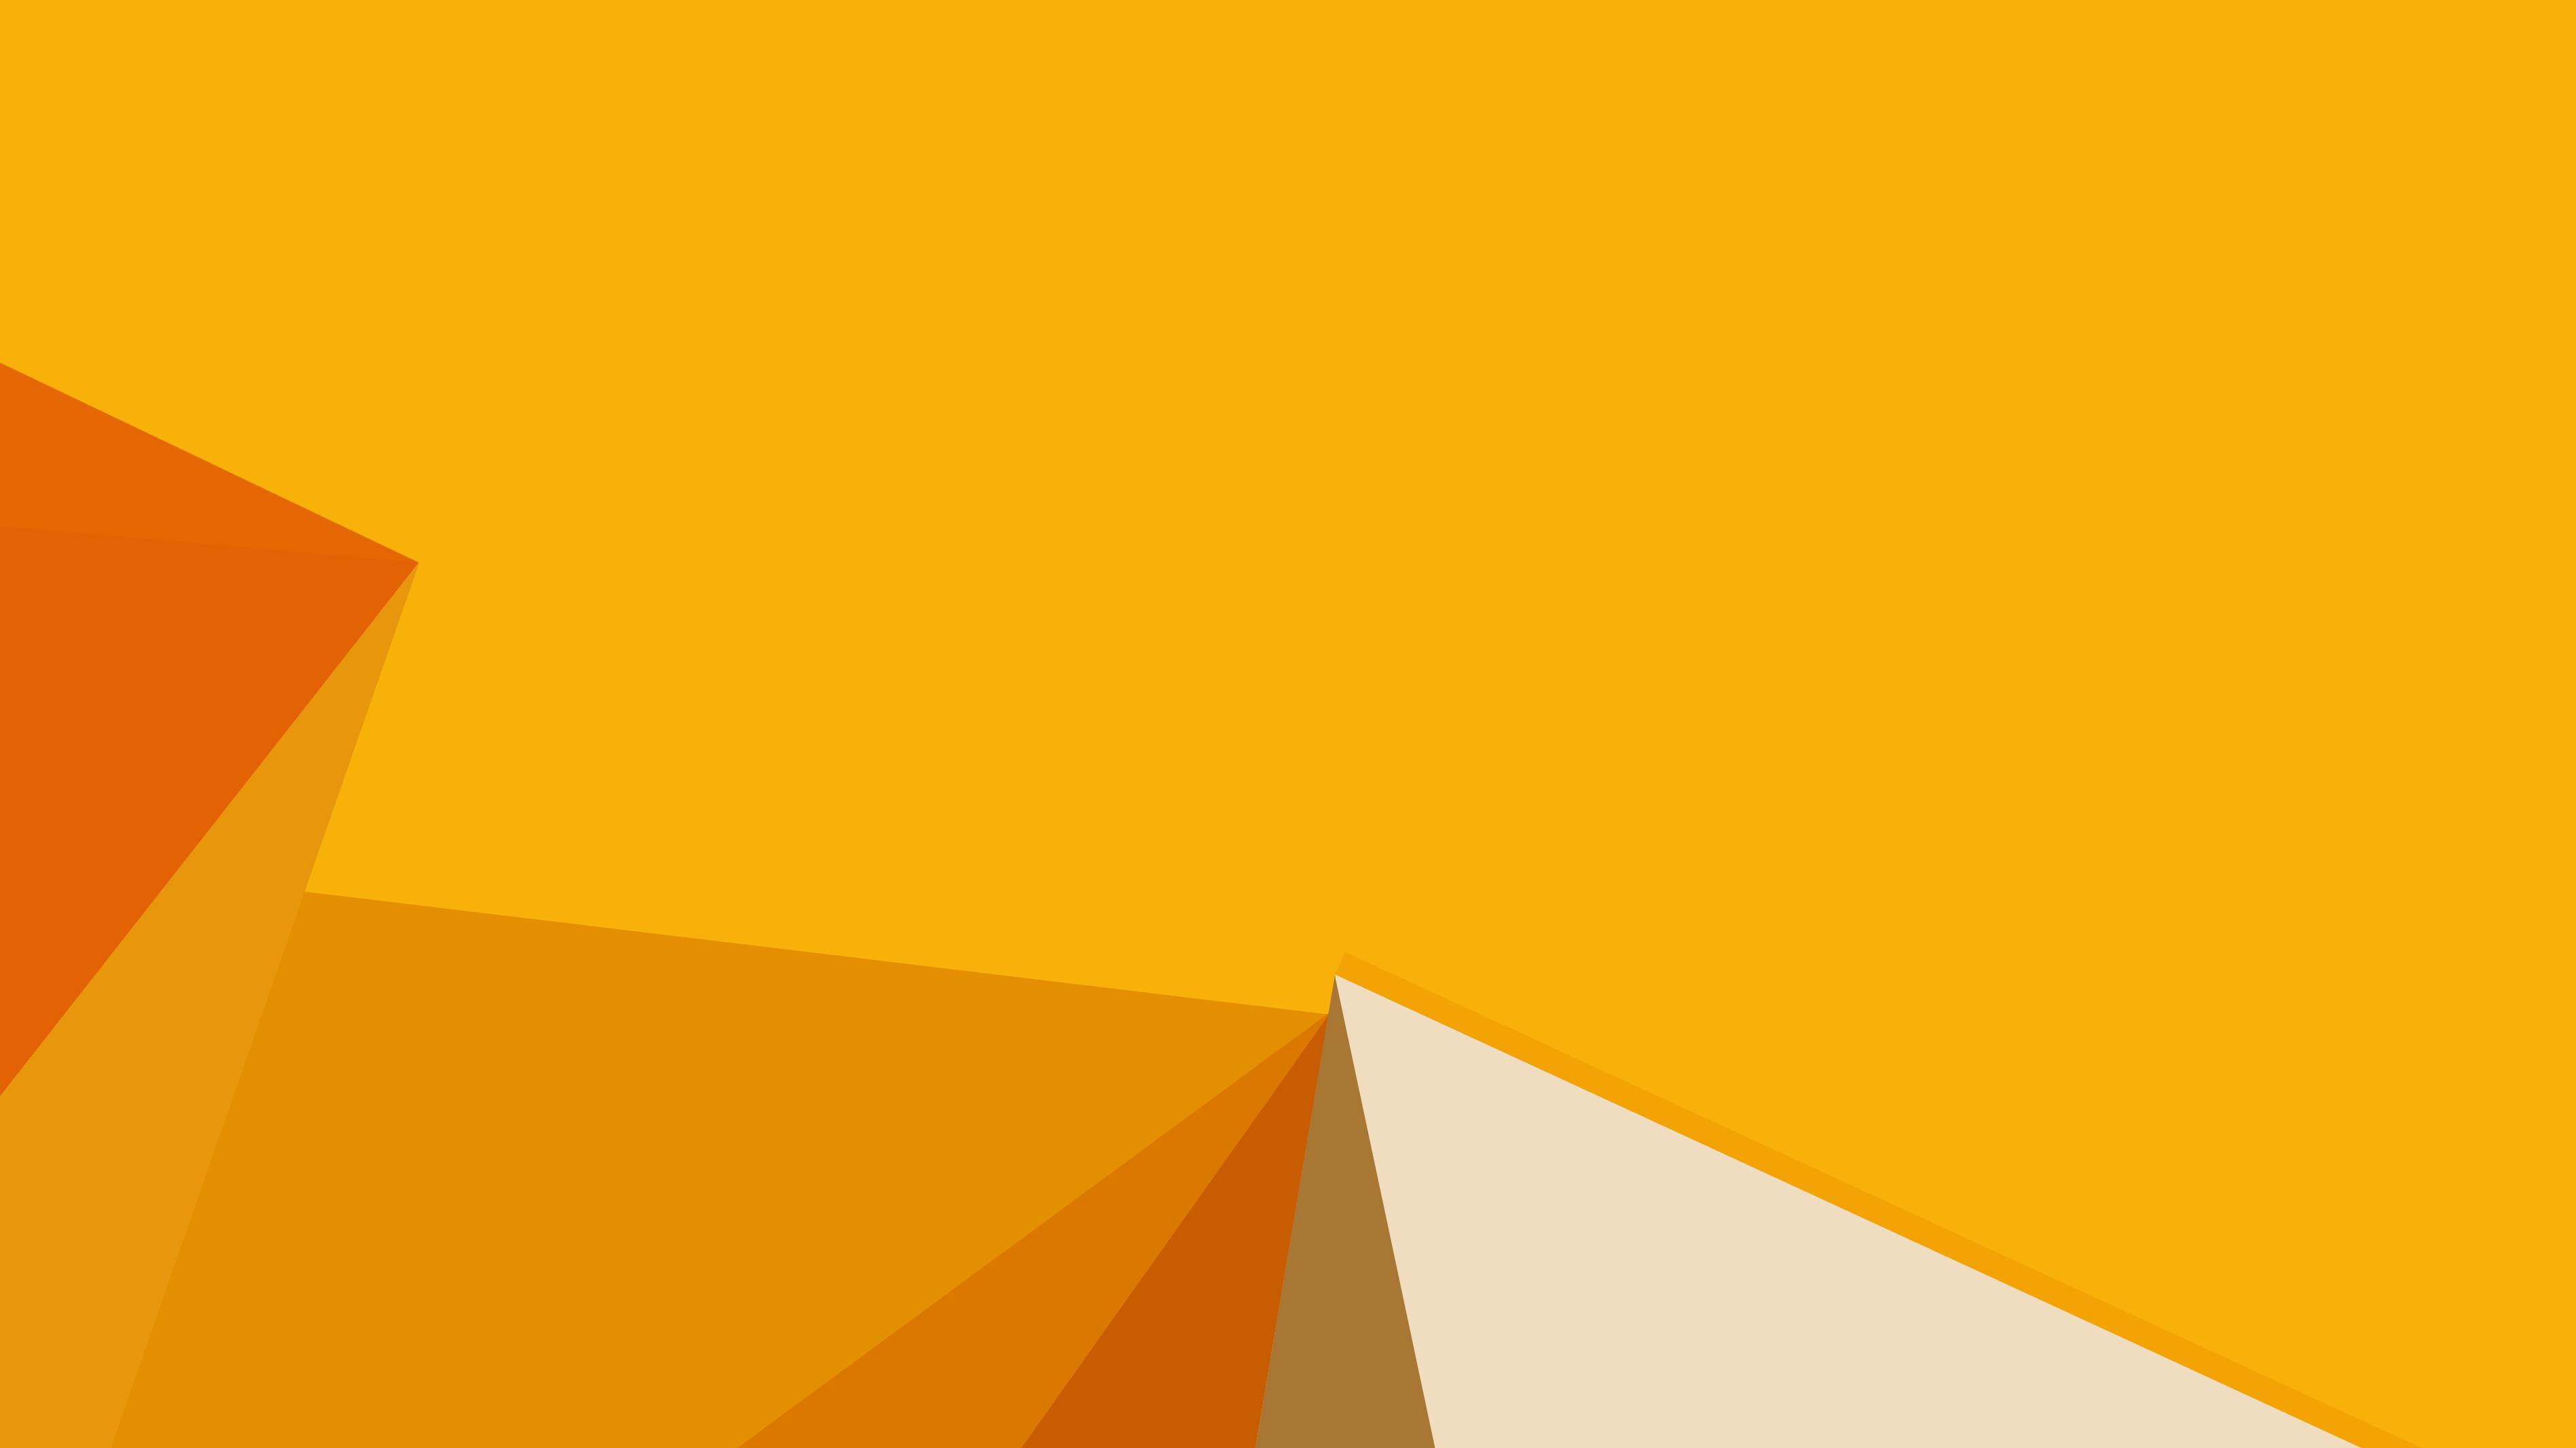 40 Best Material Design Wallpapers 4K 2016 HD Windows 7 8 10 3794x2133